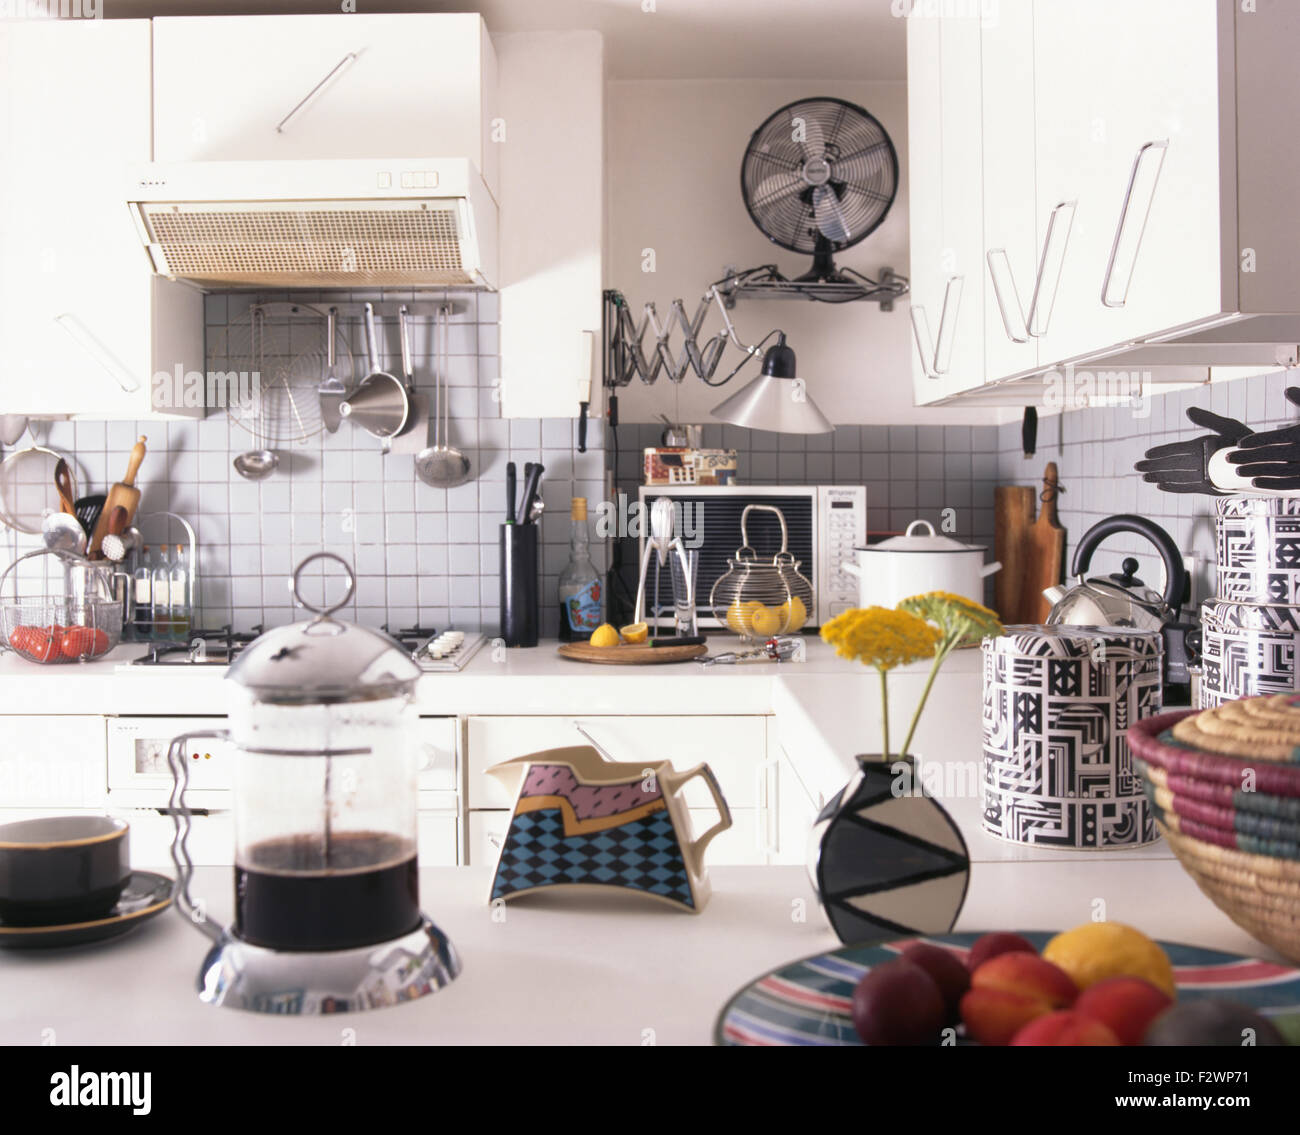 Art Deco Style Stockfotos & Art Deco Style Bilder - Alamy